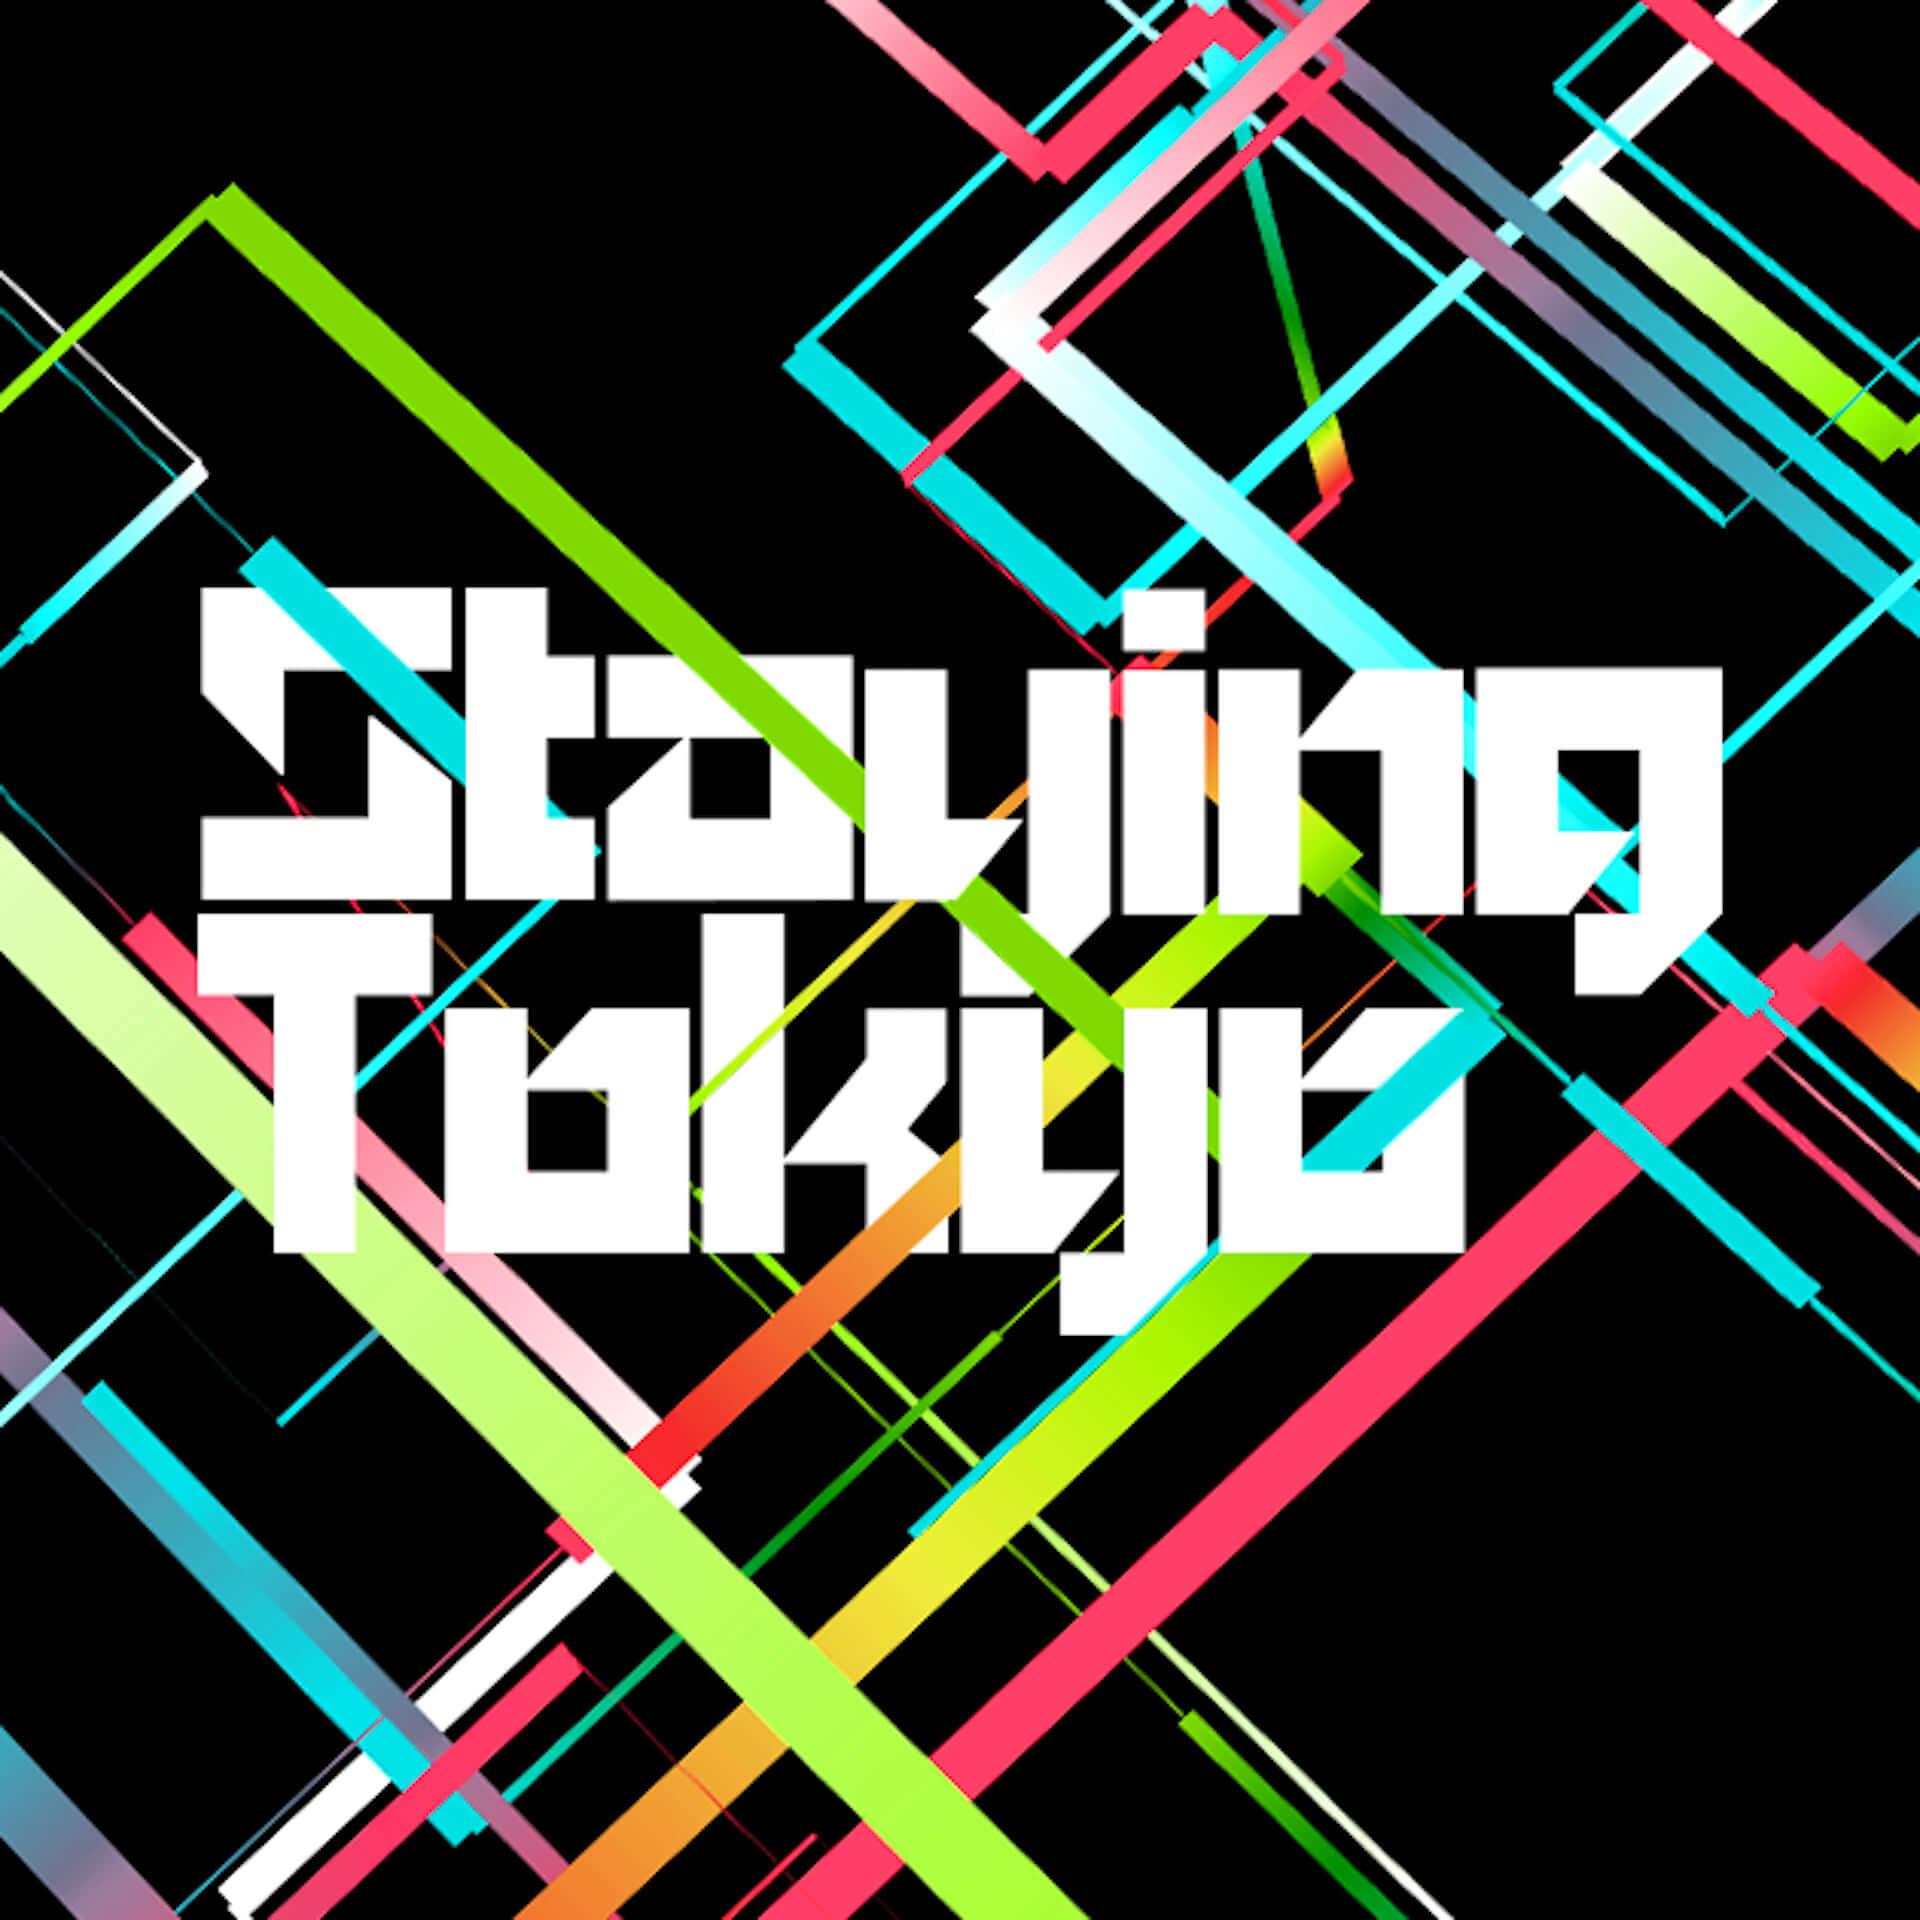 Rhizomatiks主催のオンラインイベント<Staying TOKYO>に長谷川祐子とOlafur Eliassonが参加決定!Keijiro Takahashiと真鍋大度も出演 art200420_staying_tokyo_3-1920x1920